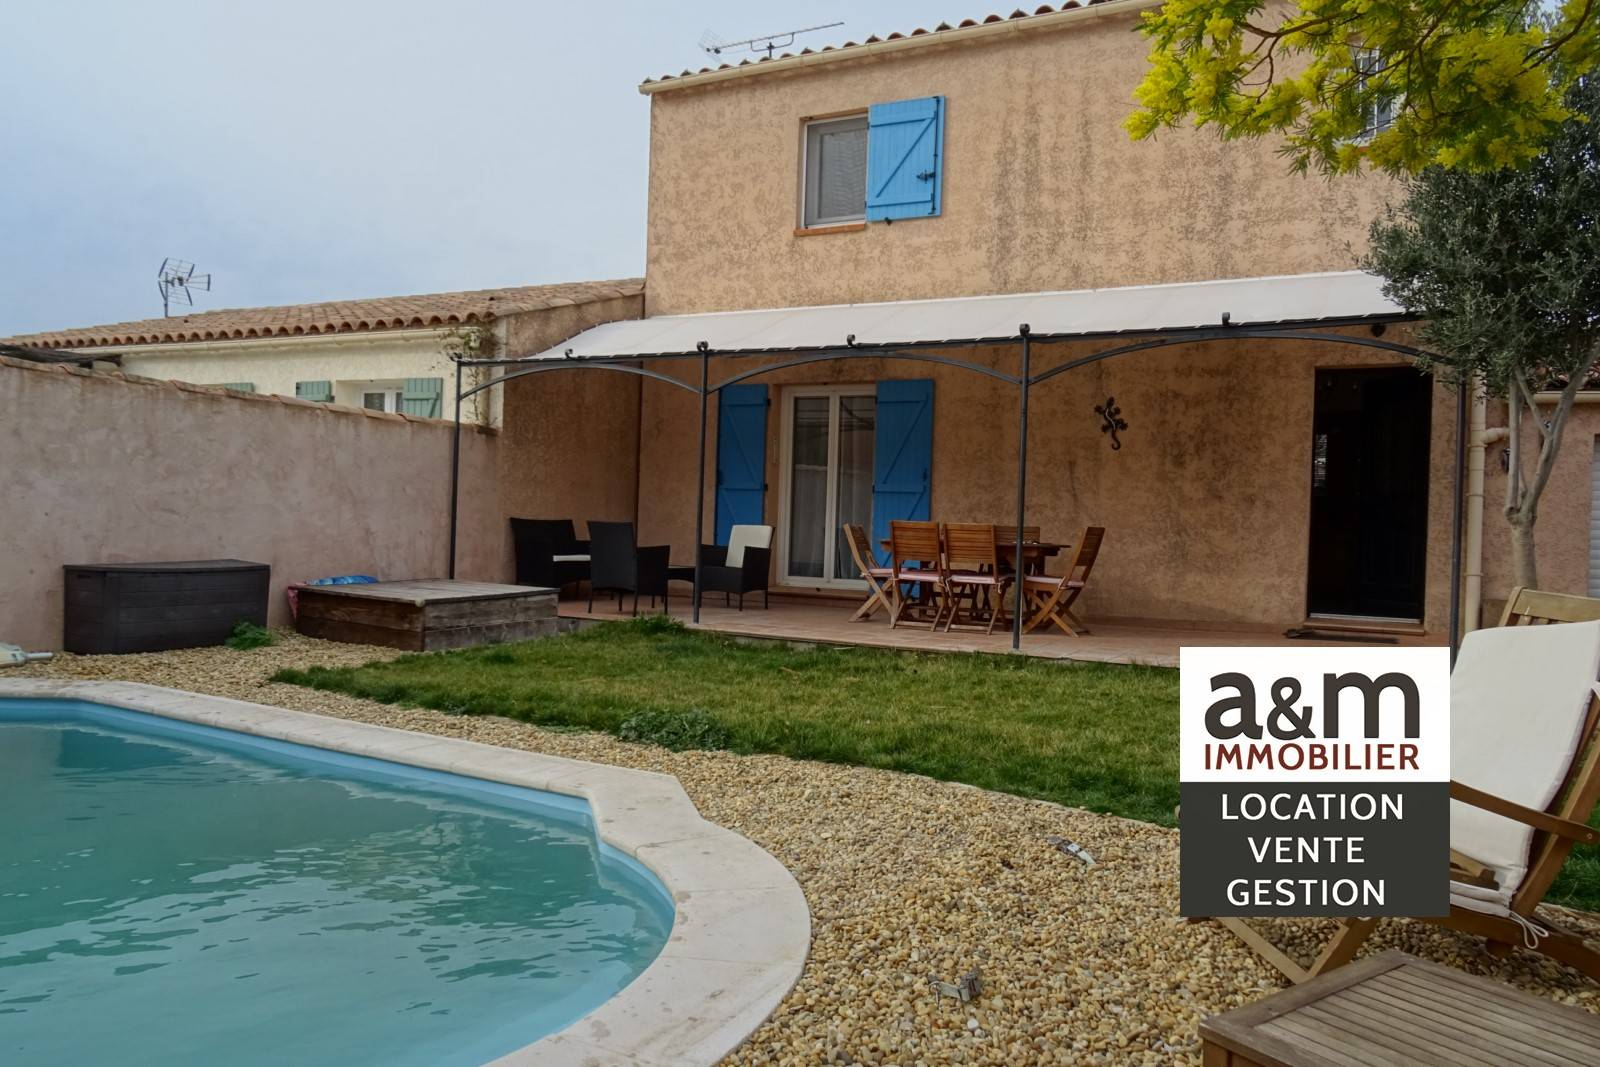 maison t4 piscine ch teauneuf les martigues agence immobili re location vente d. Black Bedroom Furniture Sets. Home Design Ideas